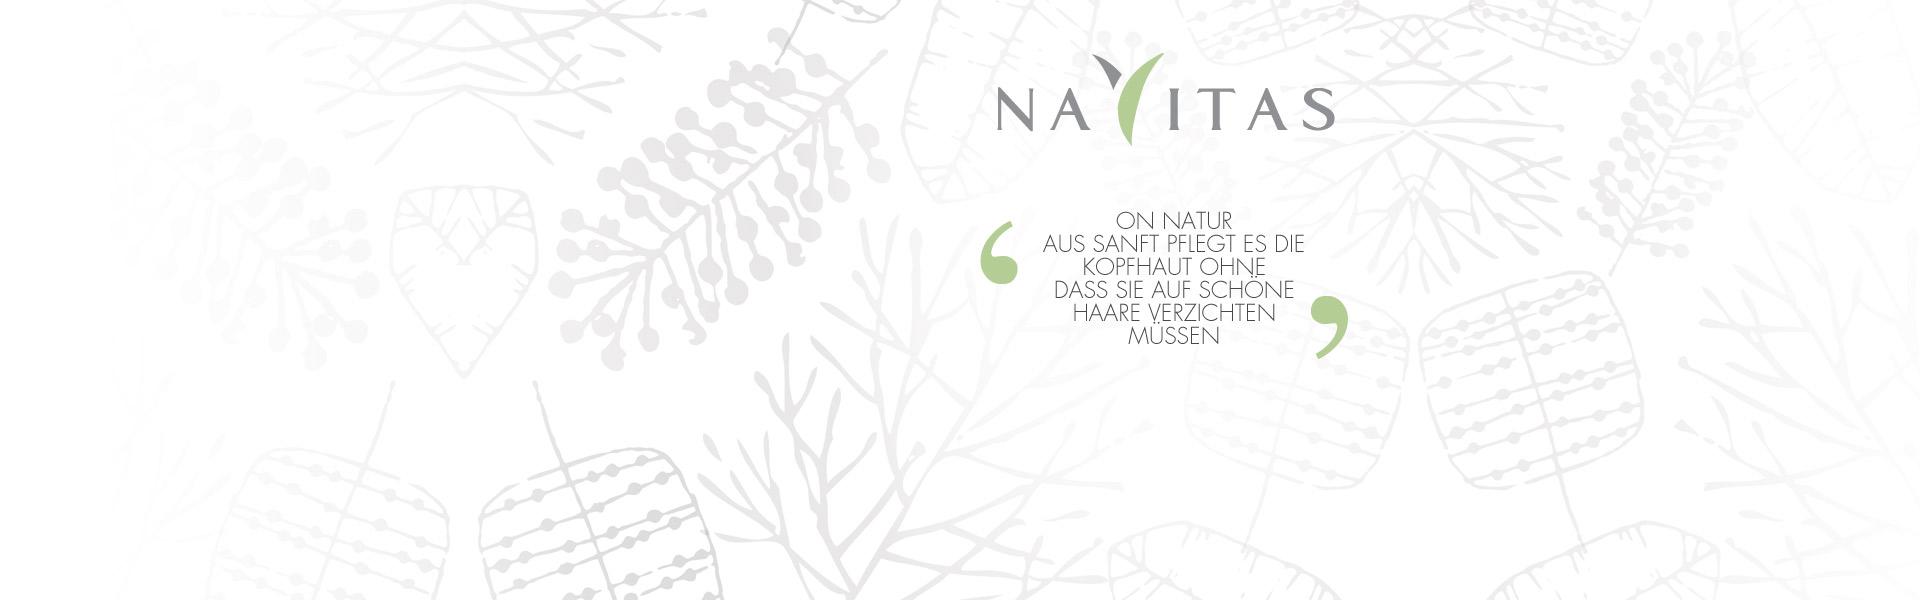 navitas_DE